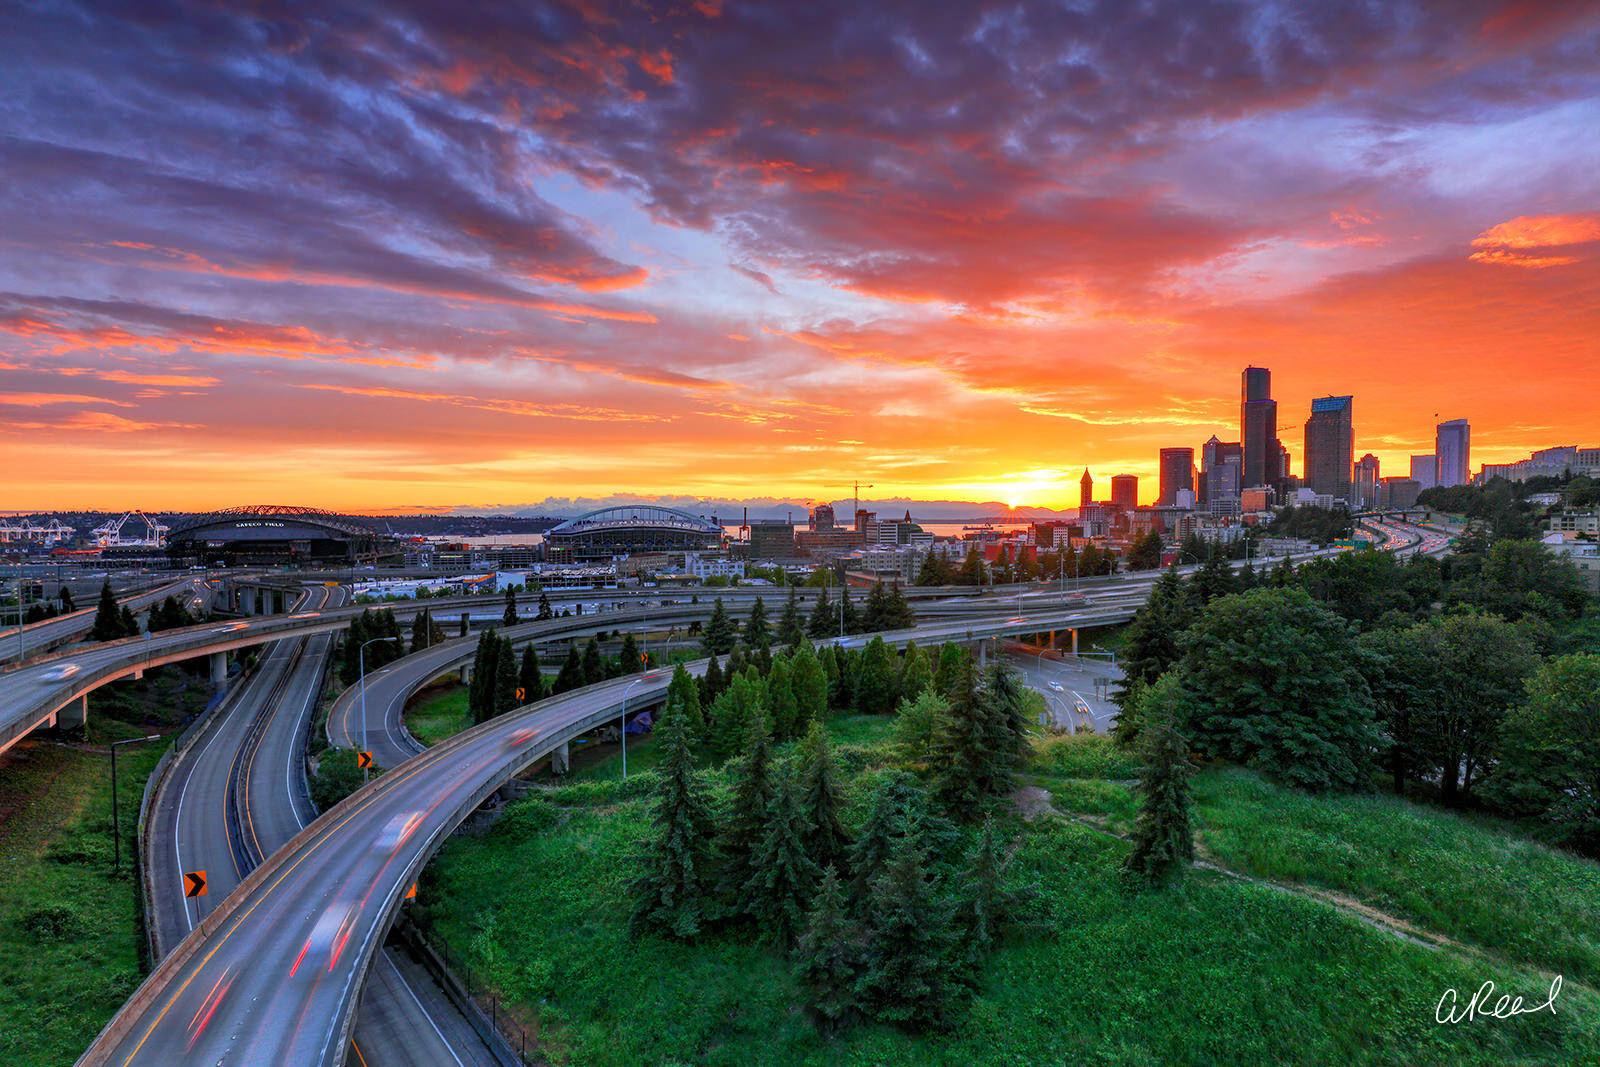 Seattle Washington Fiery sunset, photo